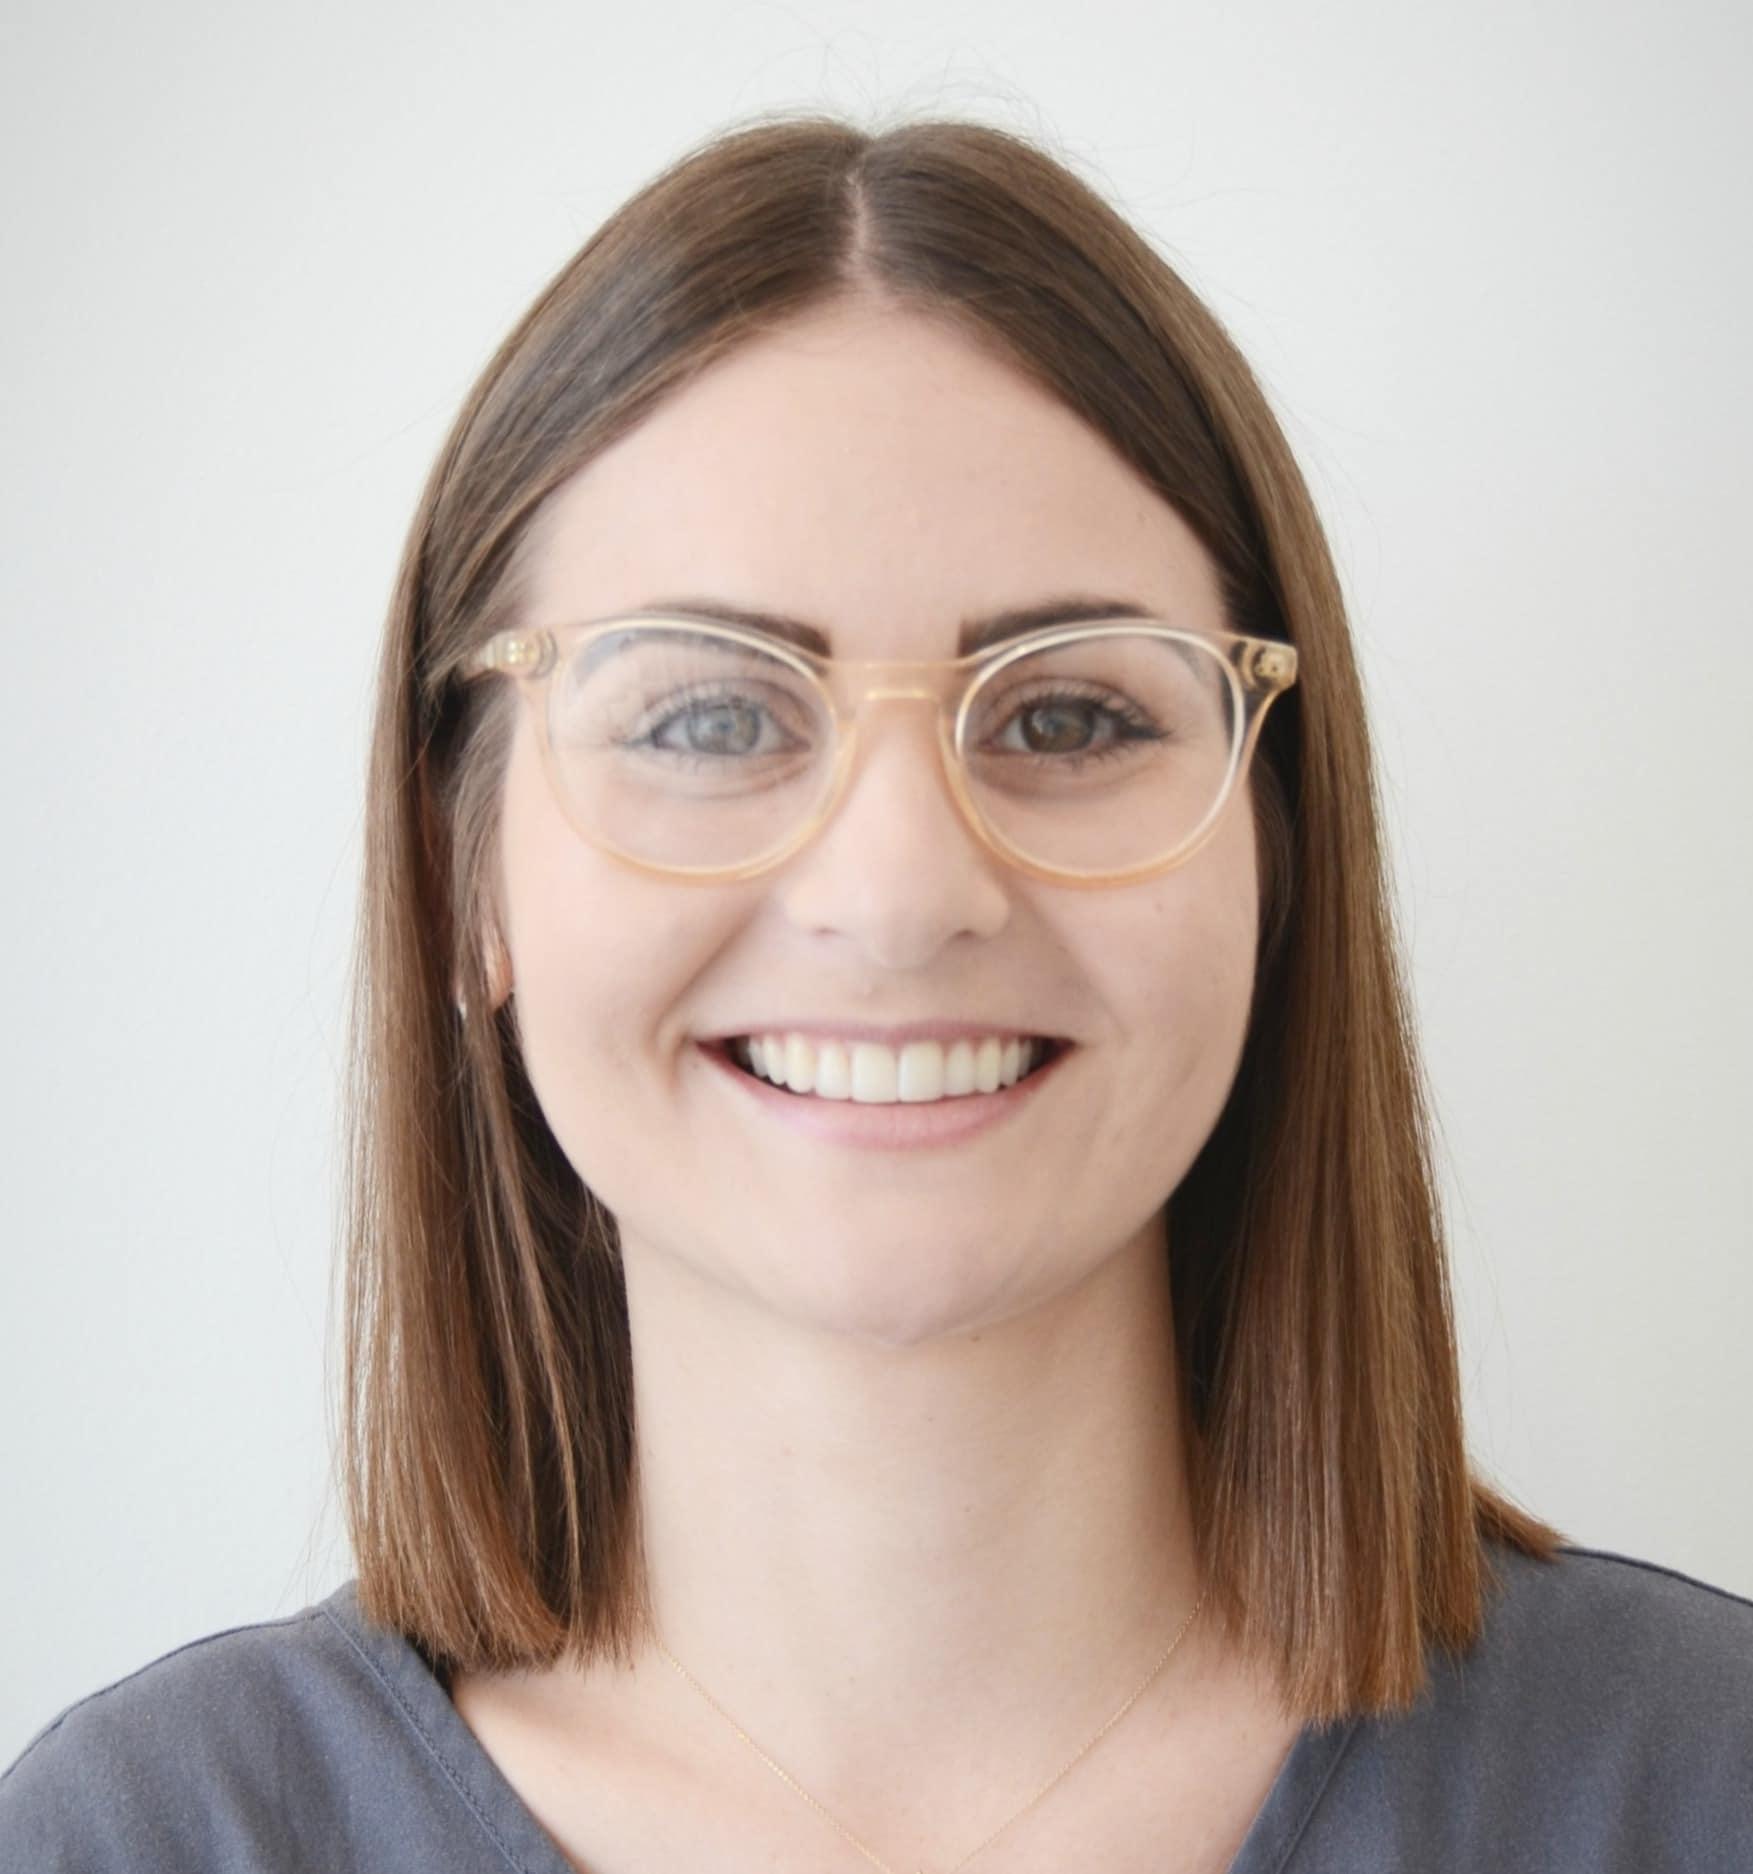 Naomi - Dental Assistant